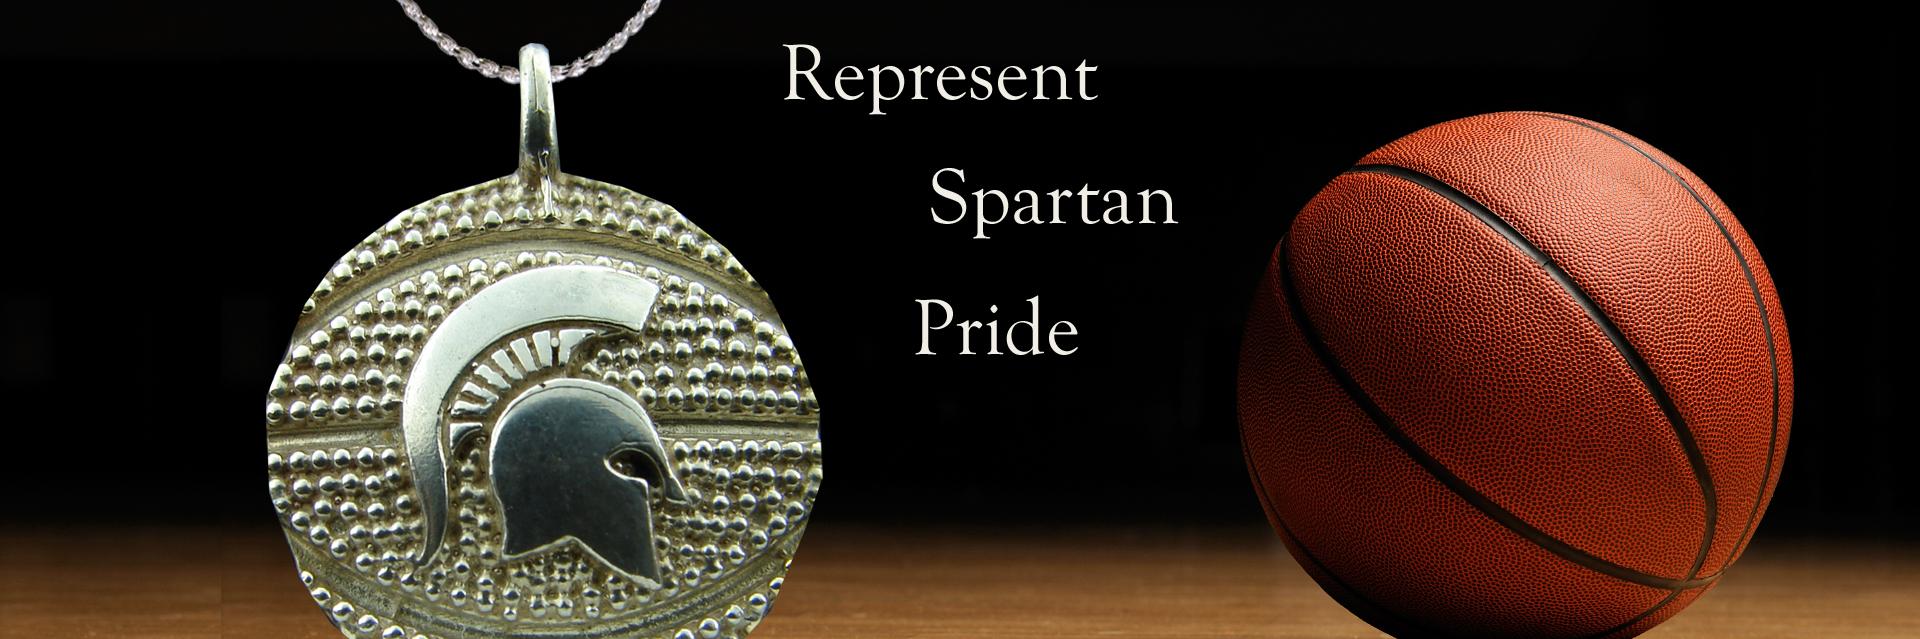 Represent Spartan Pride